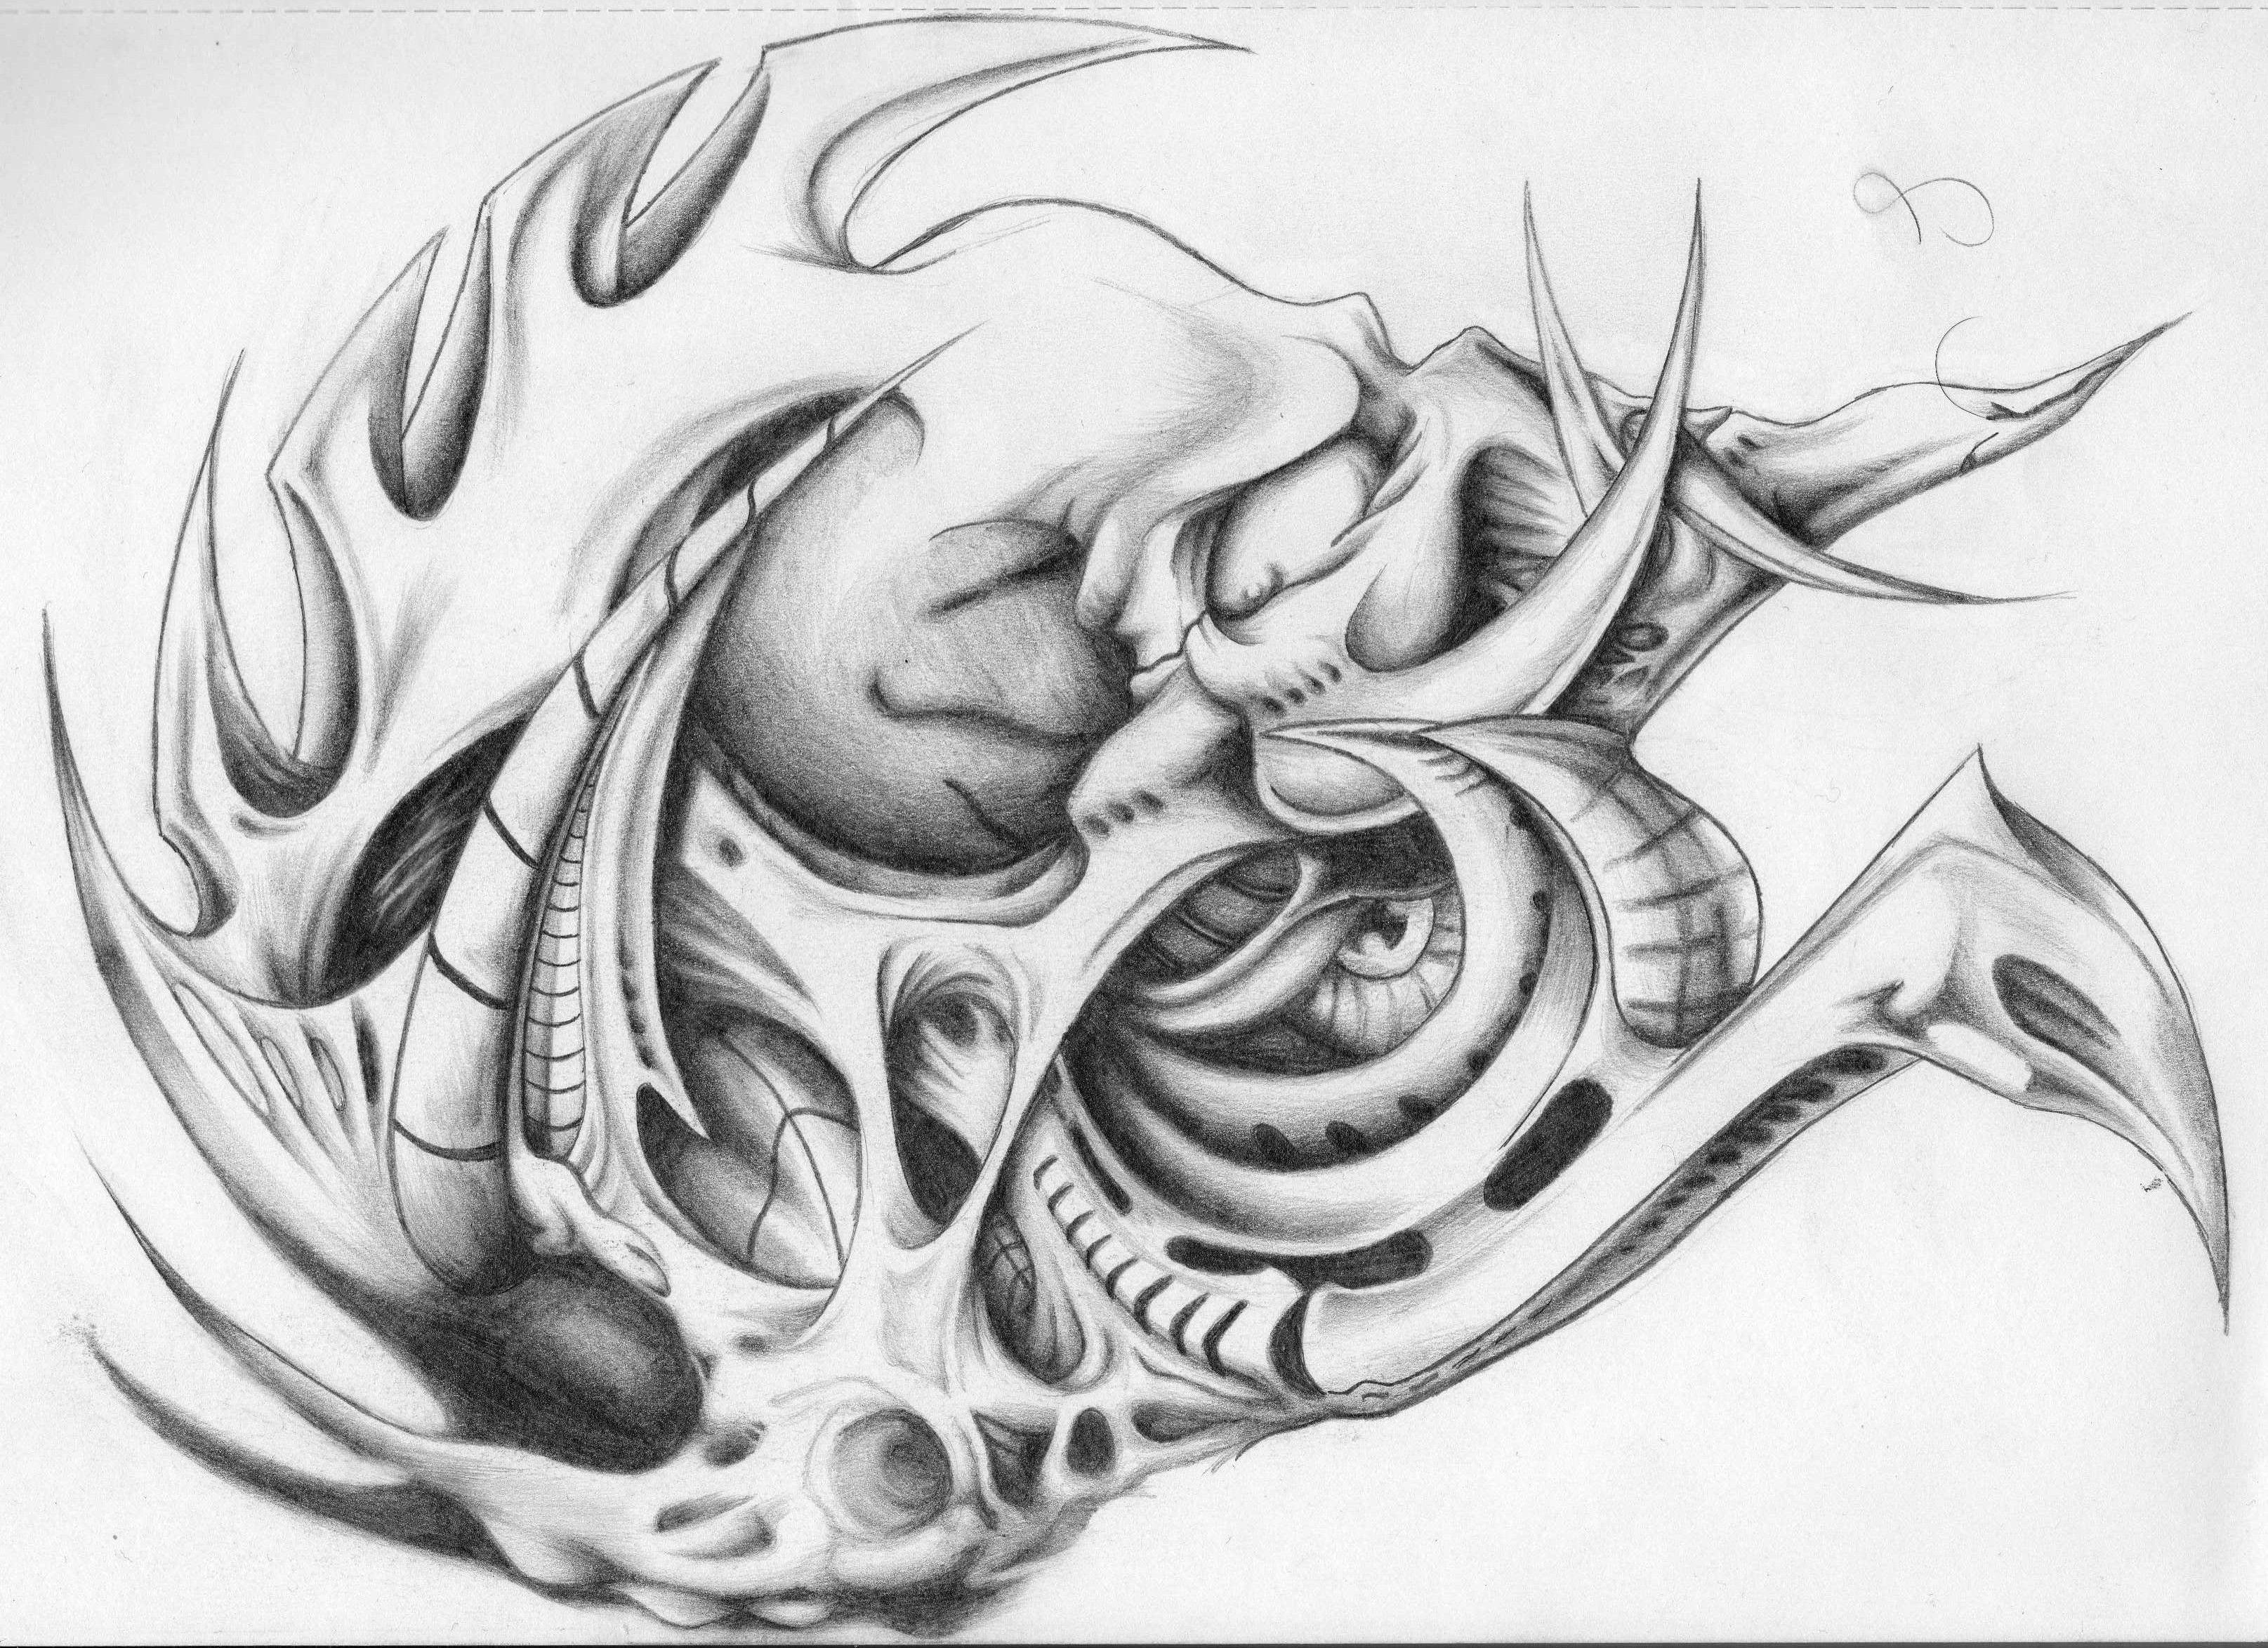 Biomechanical tattoos designs - Biomechanical Drawing Tattoo Design